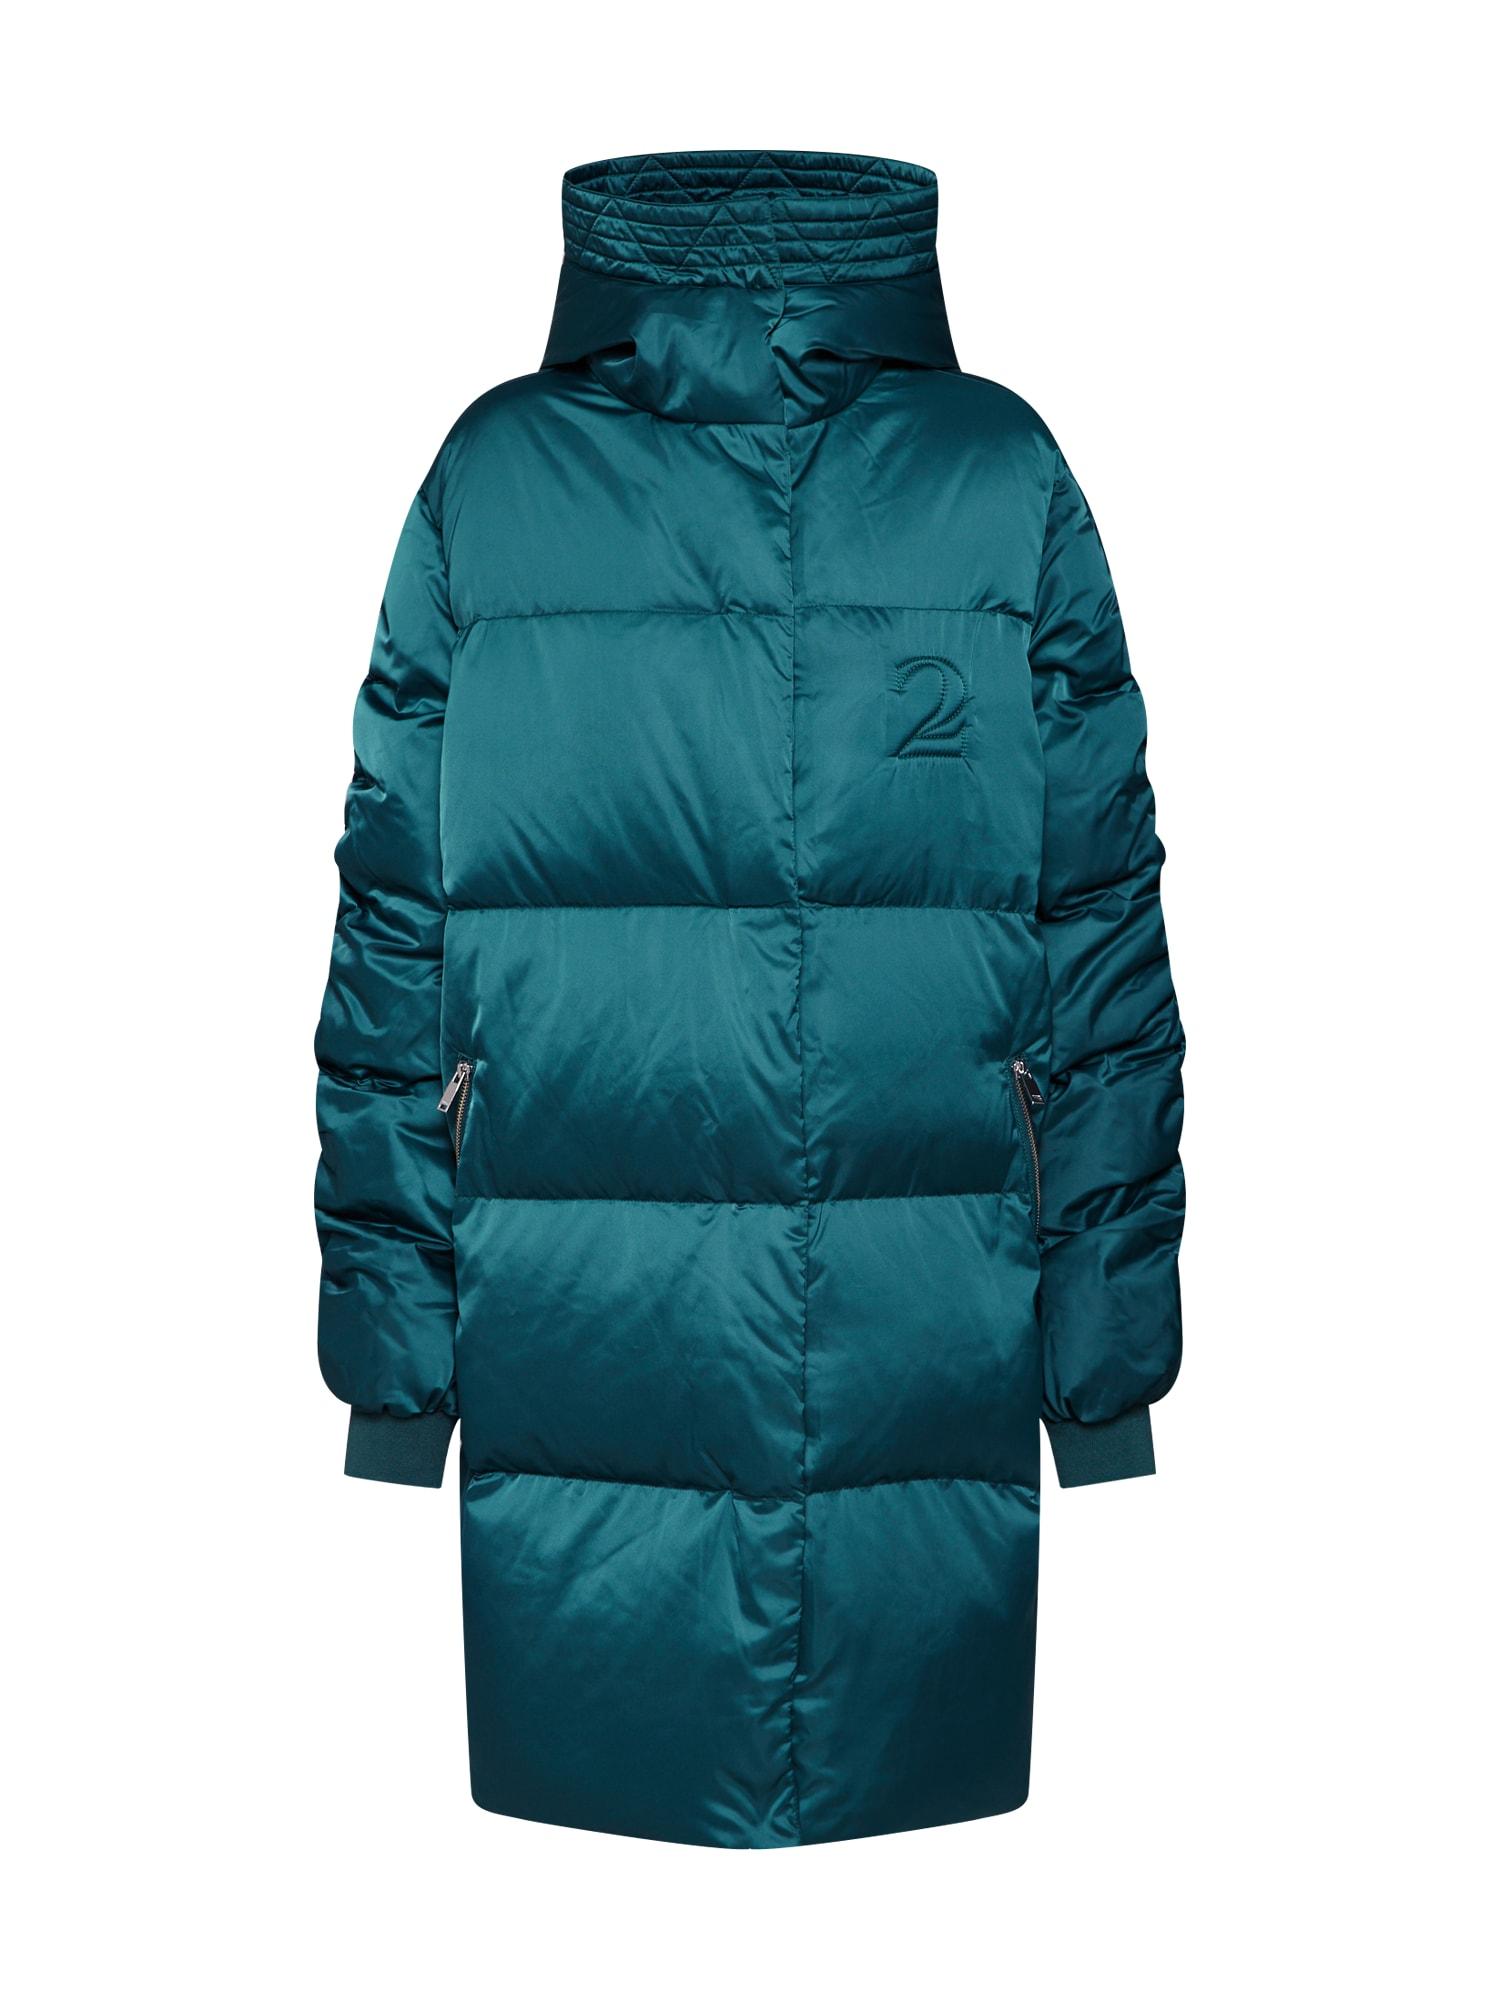 2NDDAY Žieminis paltas 'Puff' benzino spalva